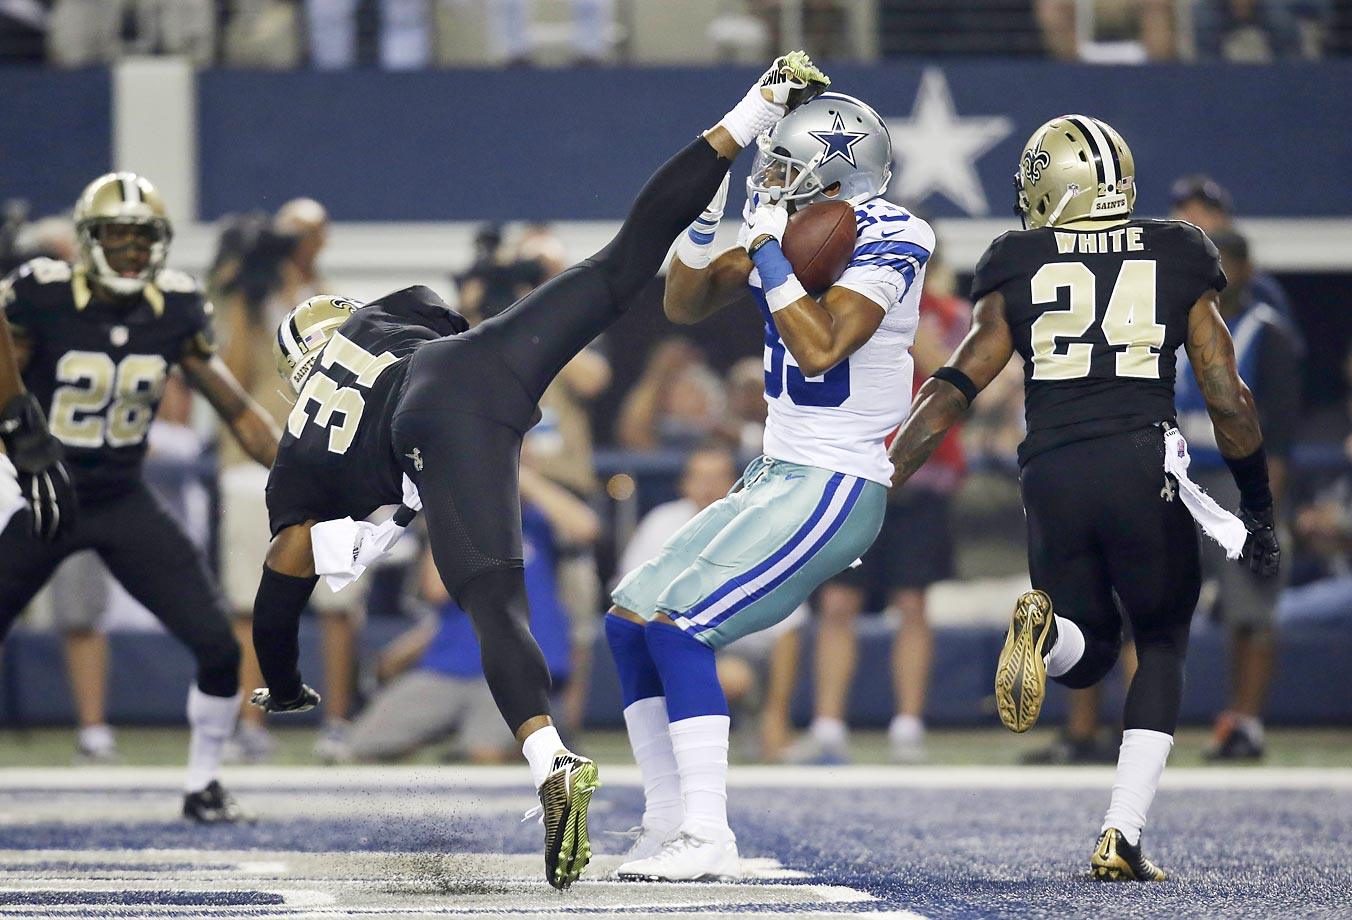 Dallas Cowboys wide receiver Terrance Williams scores a touchdown against the New Orleans Saints.